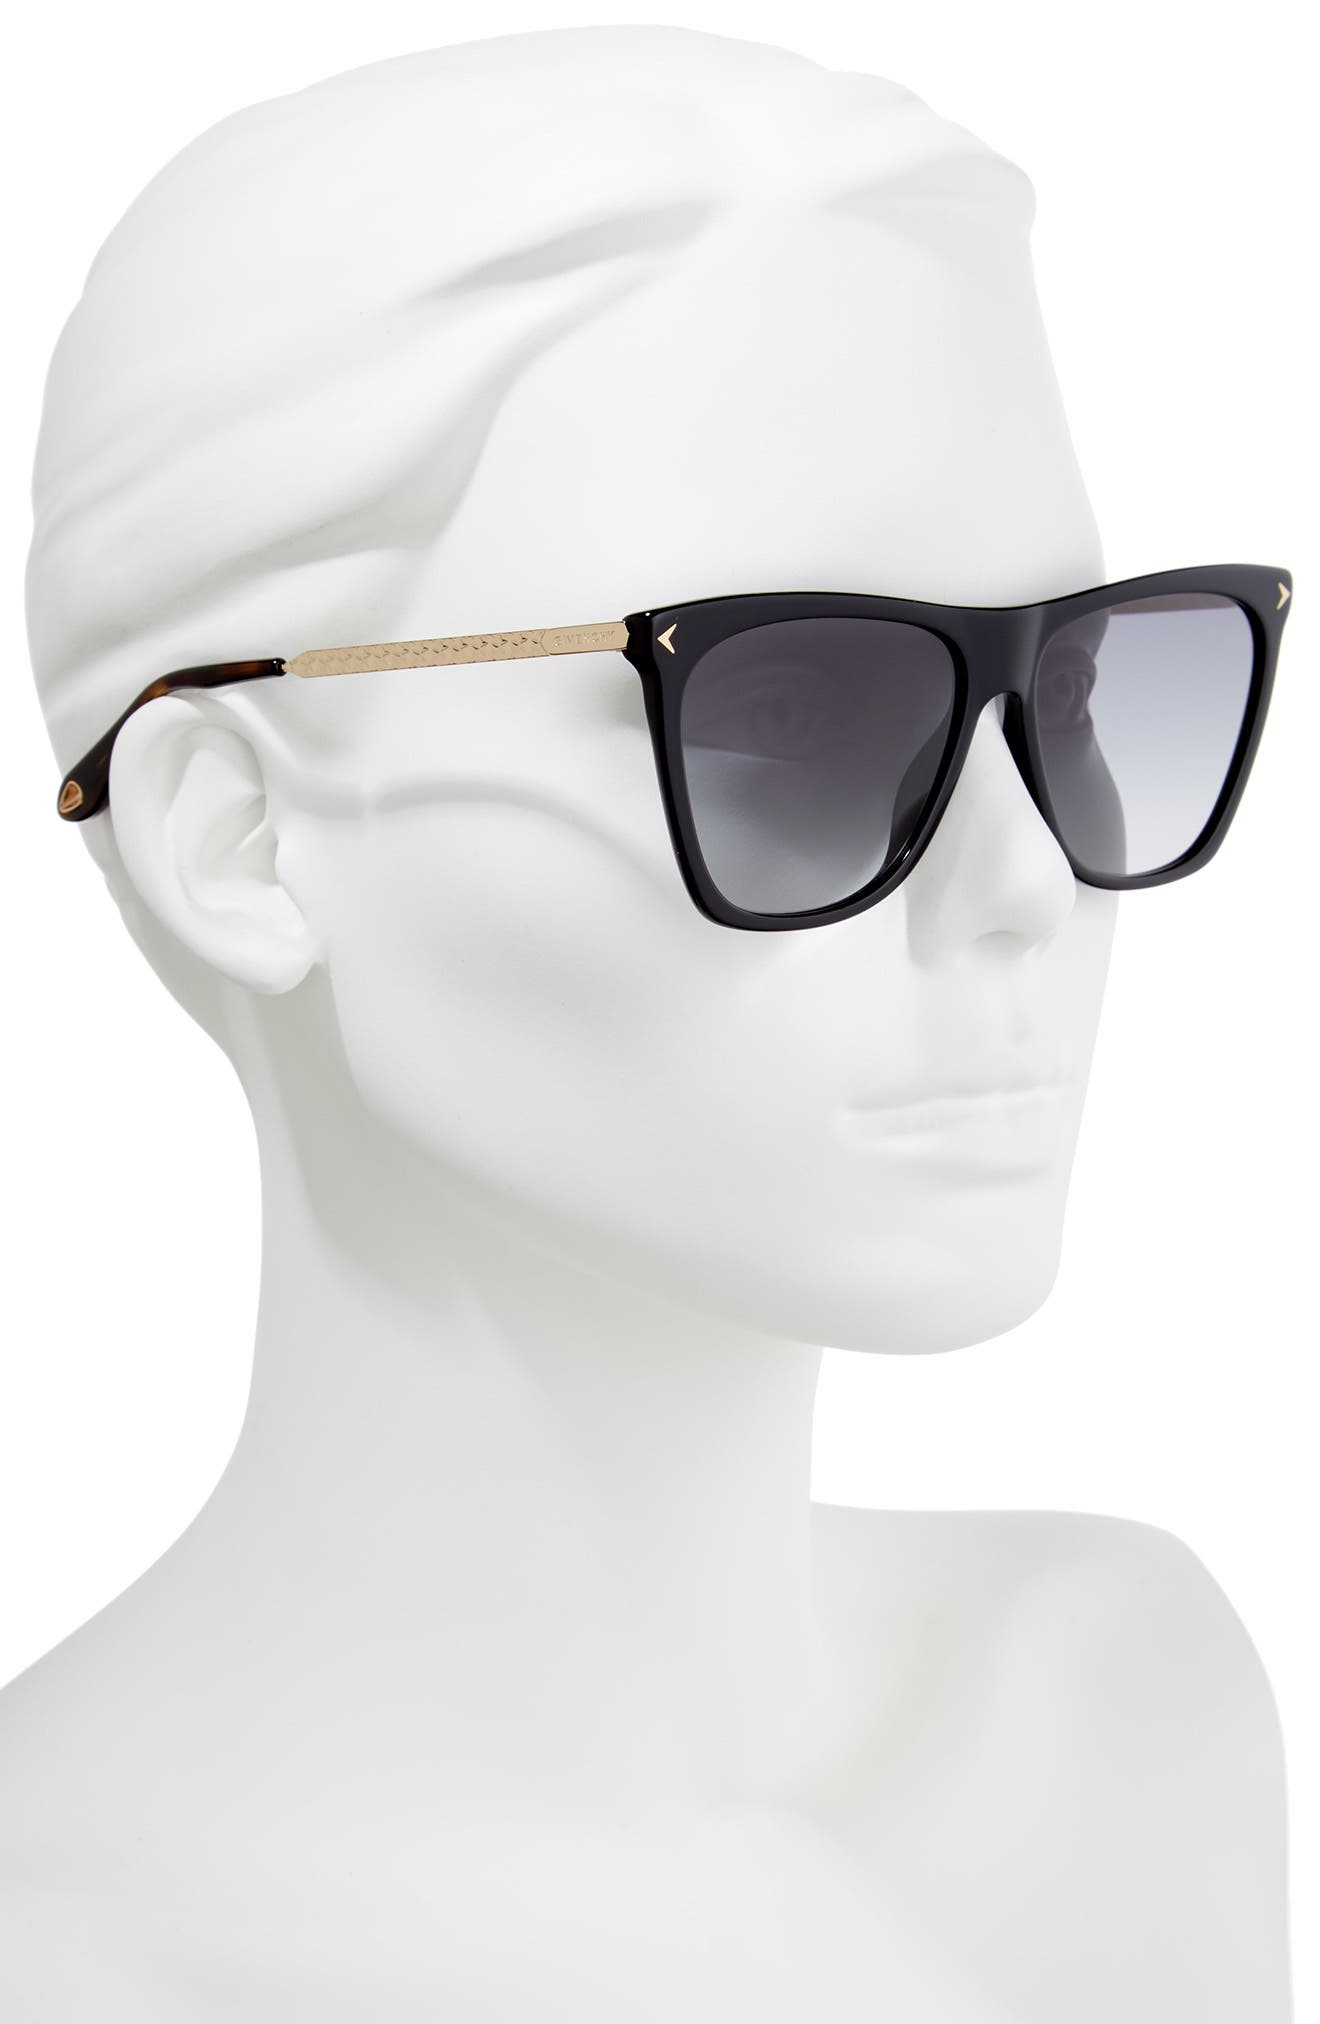 58mm Flat Top Sunglasses,                             Alternate thumbnail 2, color,                             BLACK